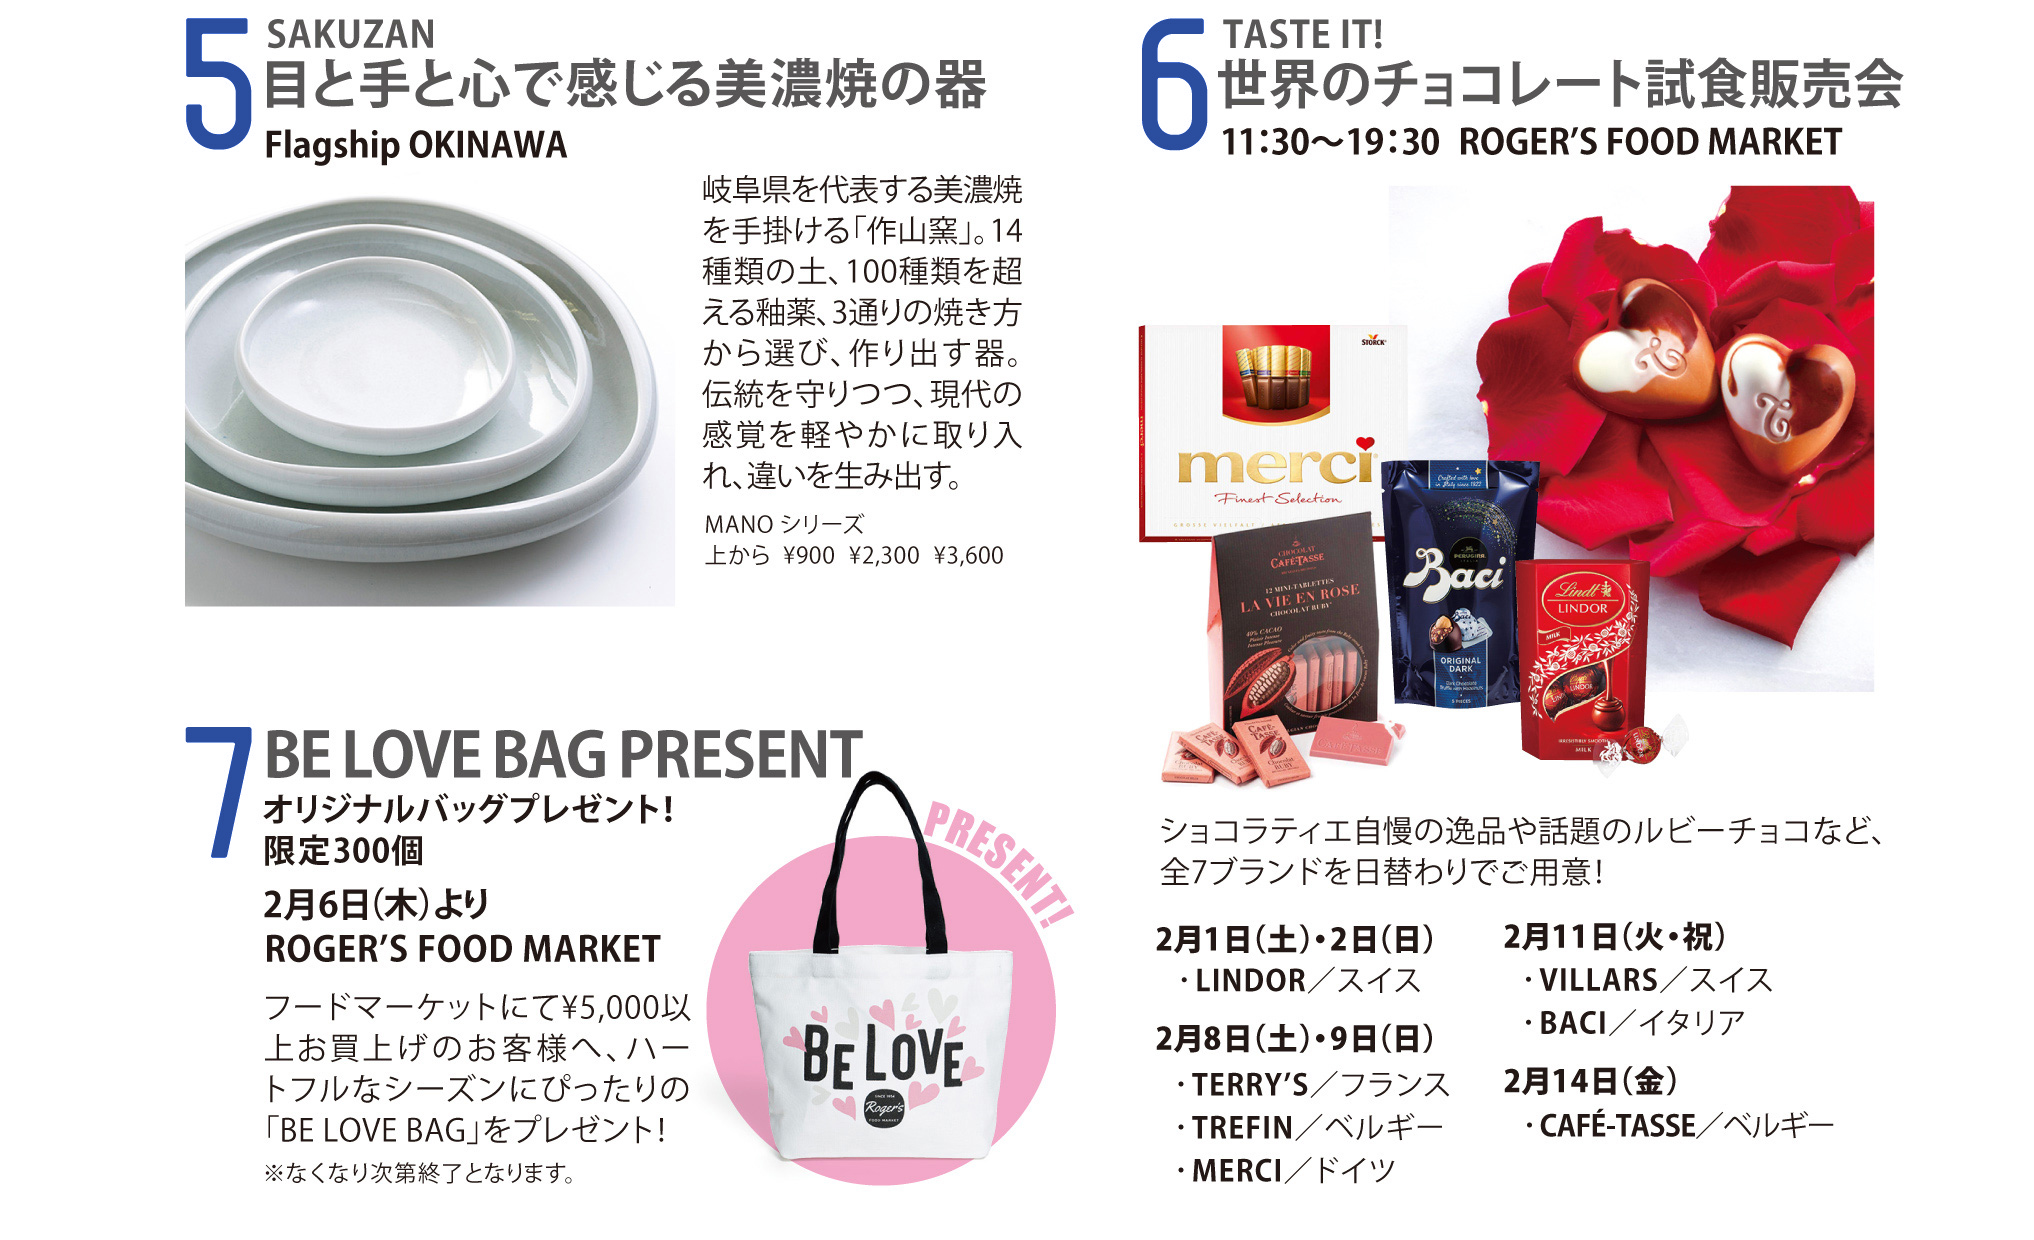 SEASONAL TOPICS 5-7 世界のチョコレート試食販売会開催!/美濃焼の器/BE LOVE BAGプレゼント!<br />